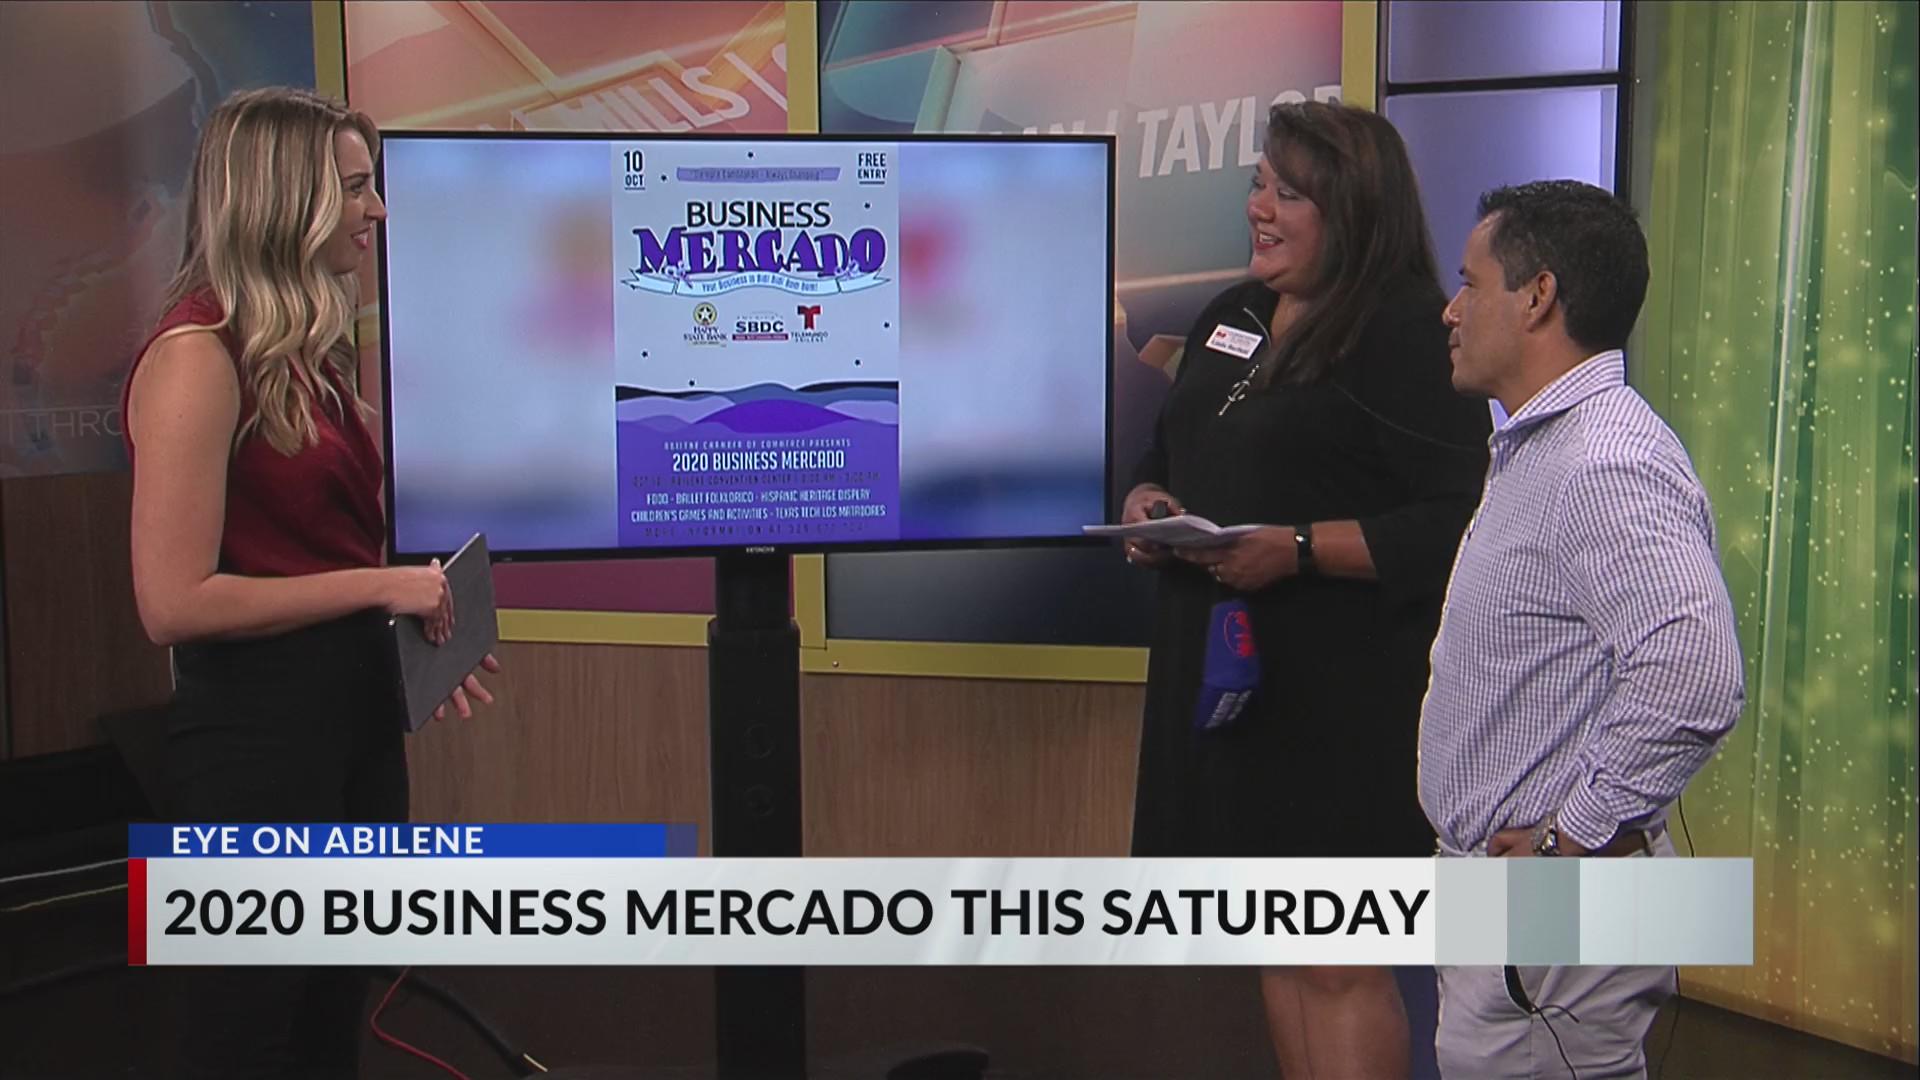 Mercado Halloween Events 2020 2020 Business Mercado coming up at The Abilene Convention Center